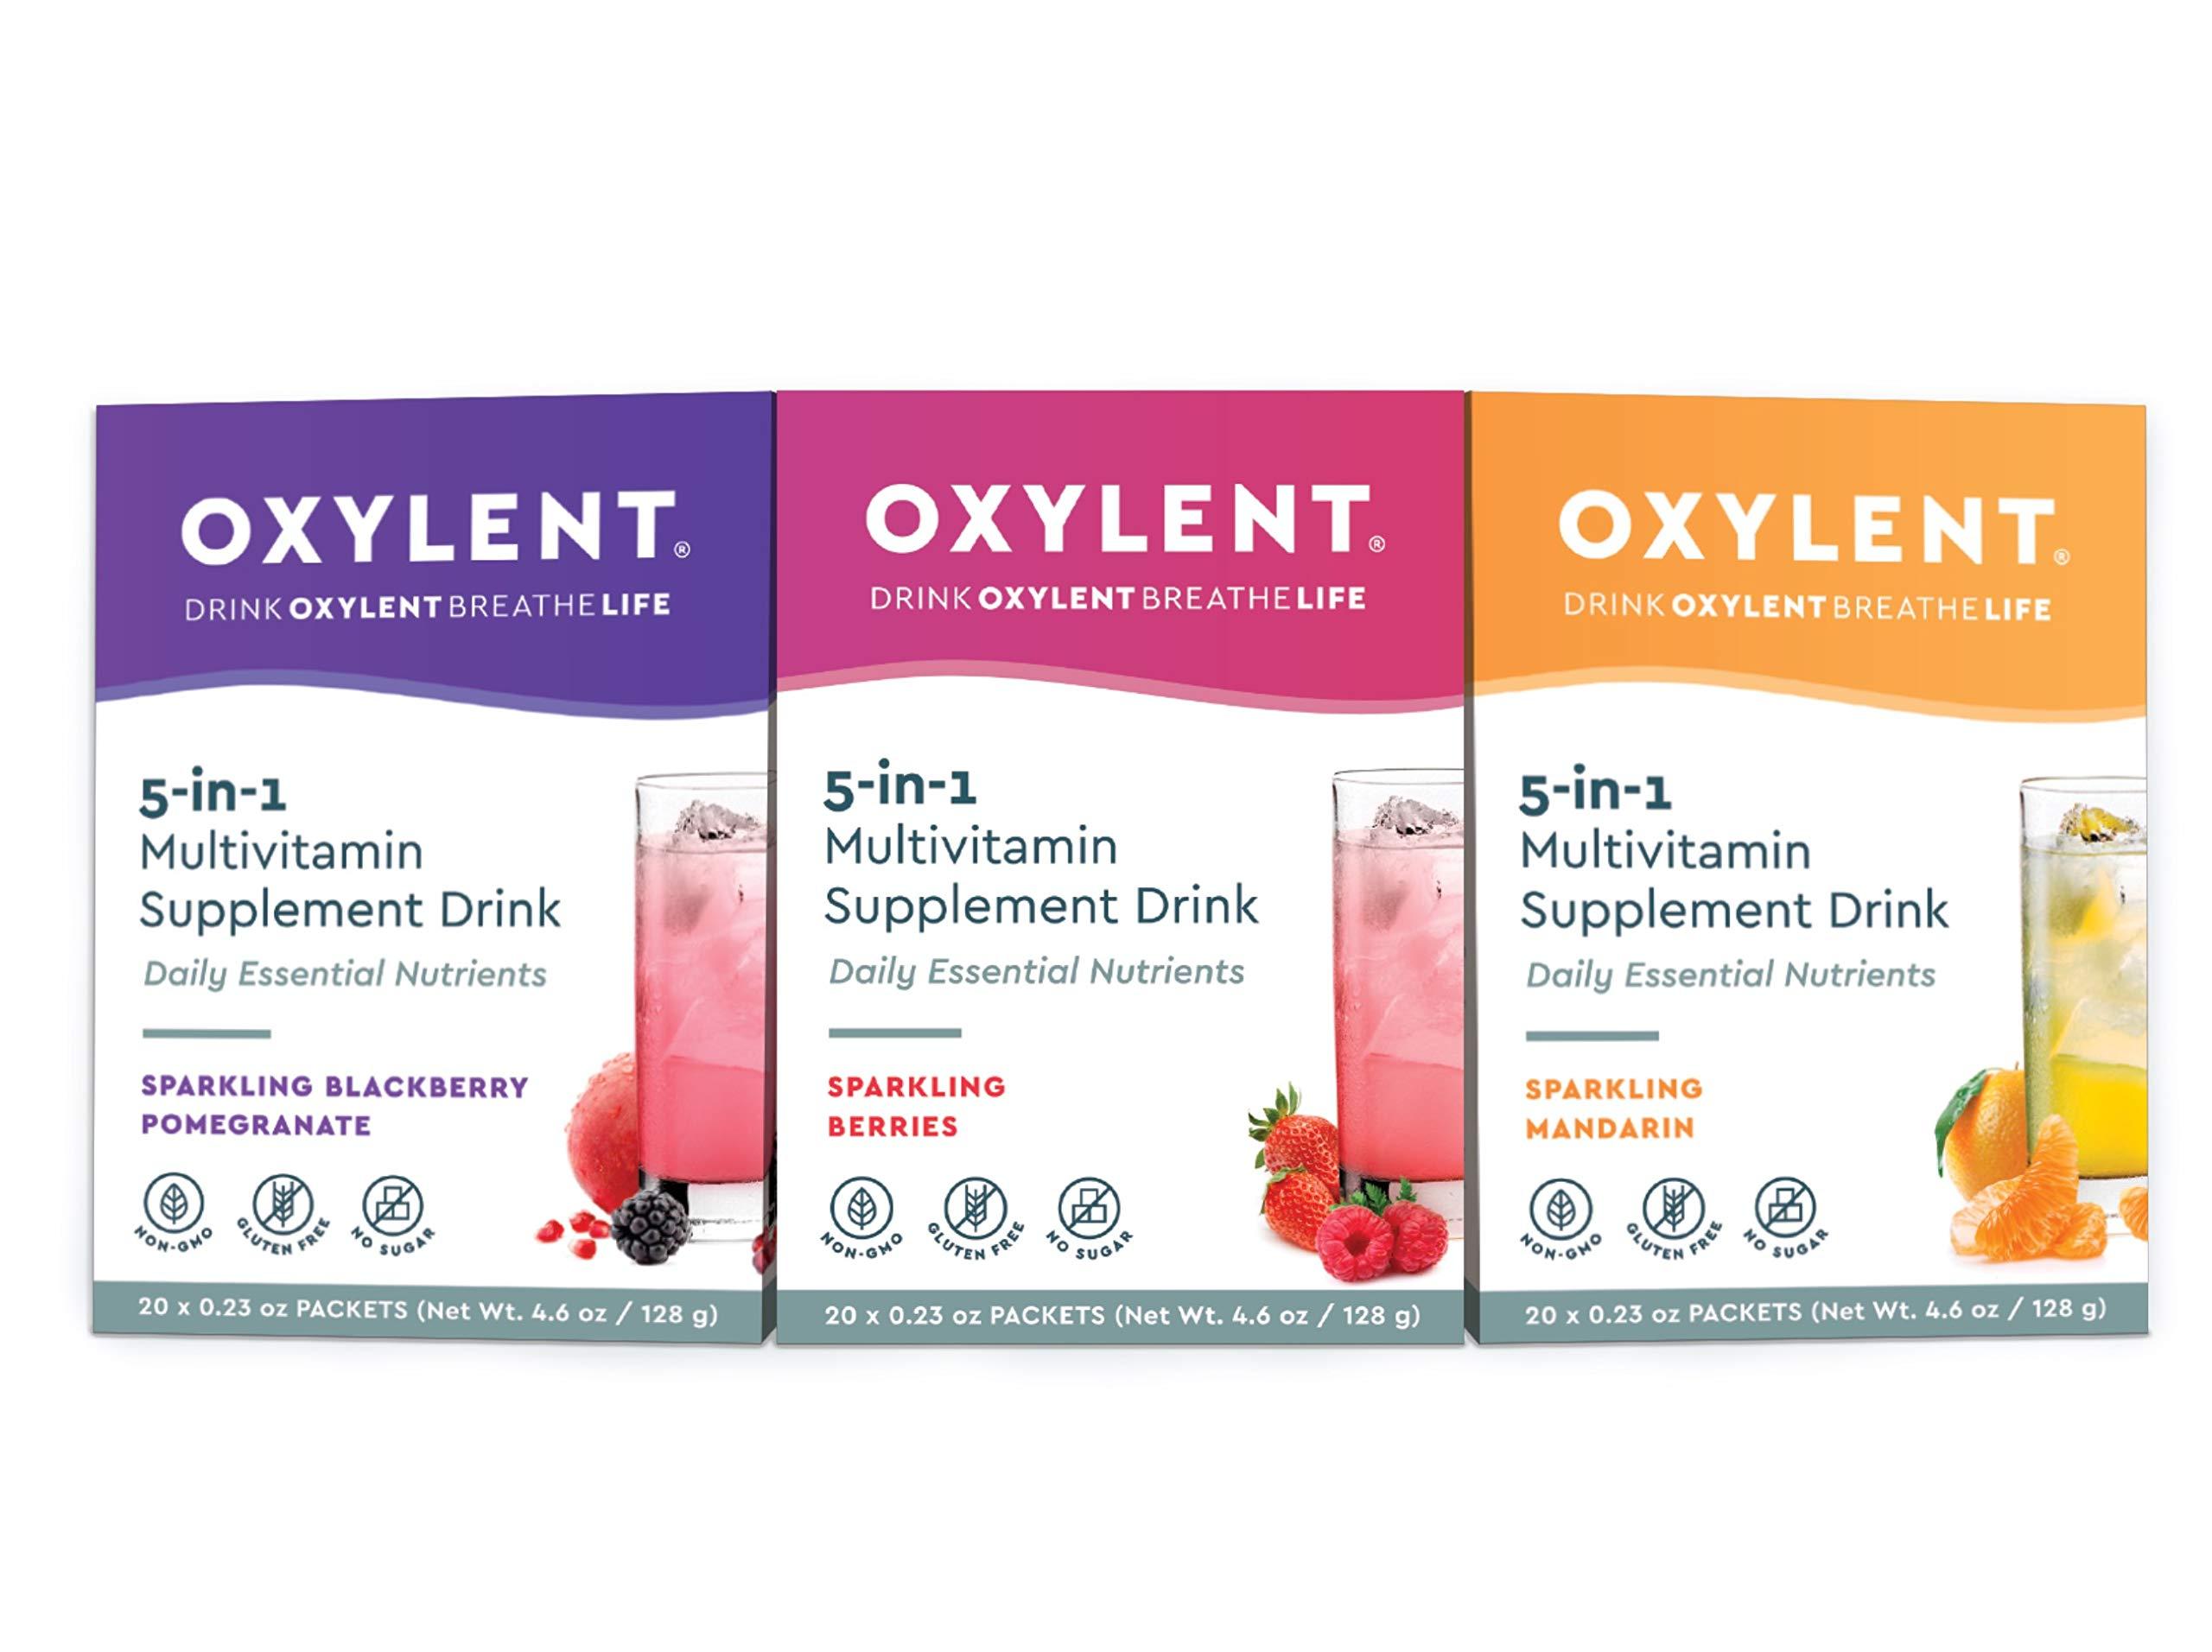 Oxylent Multivitamin Supplement Drink Effervescent